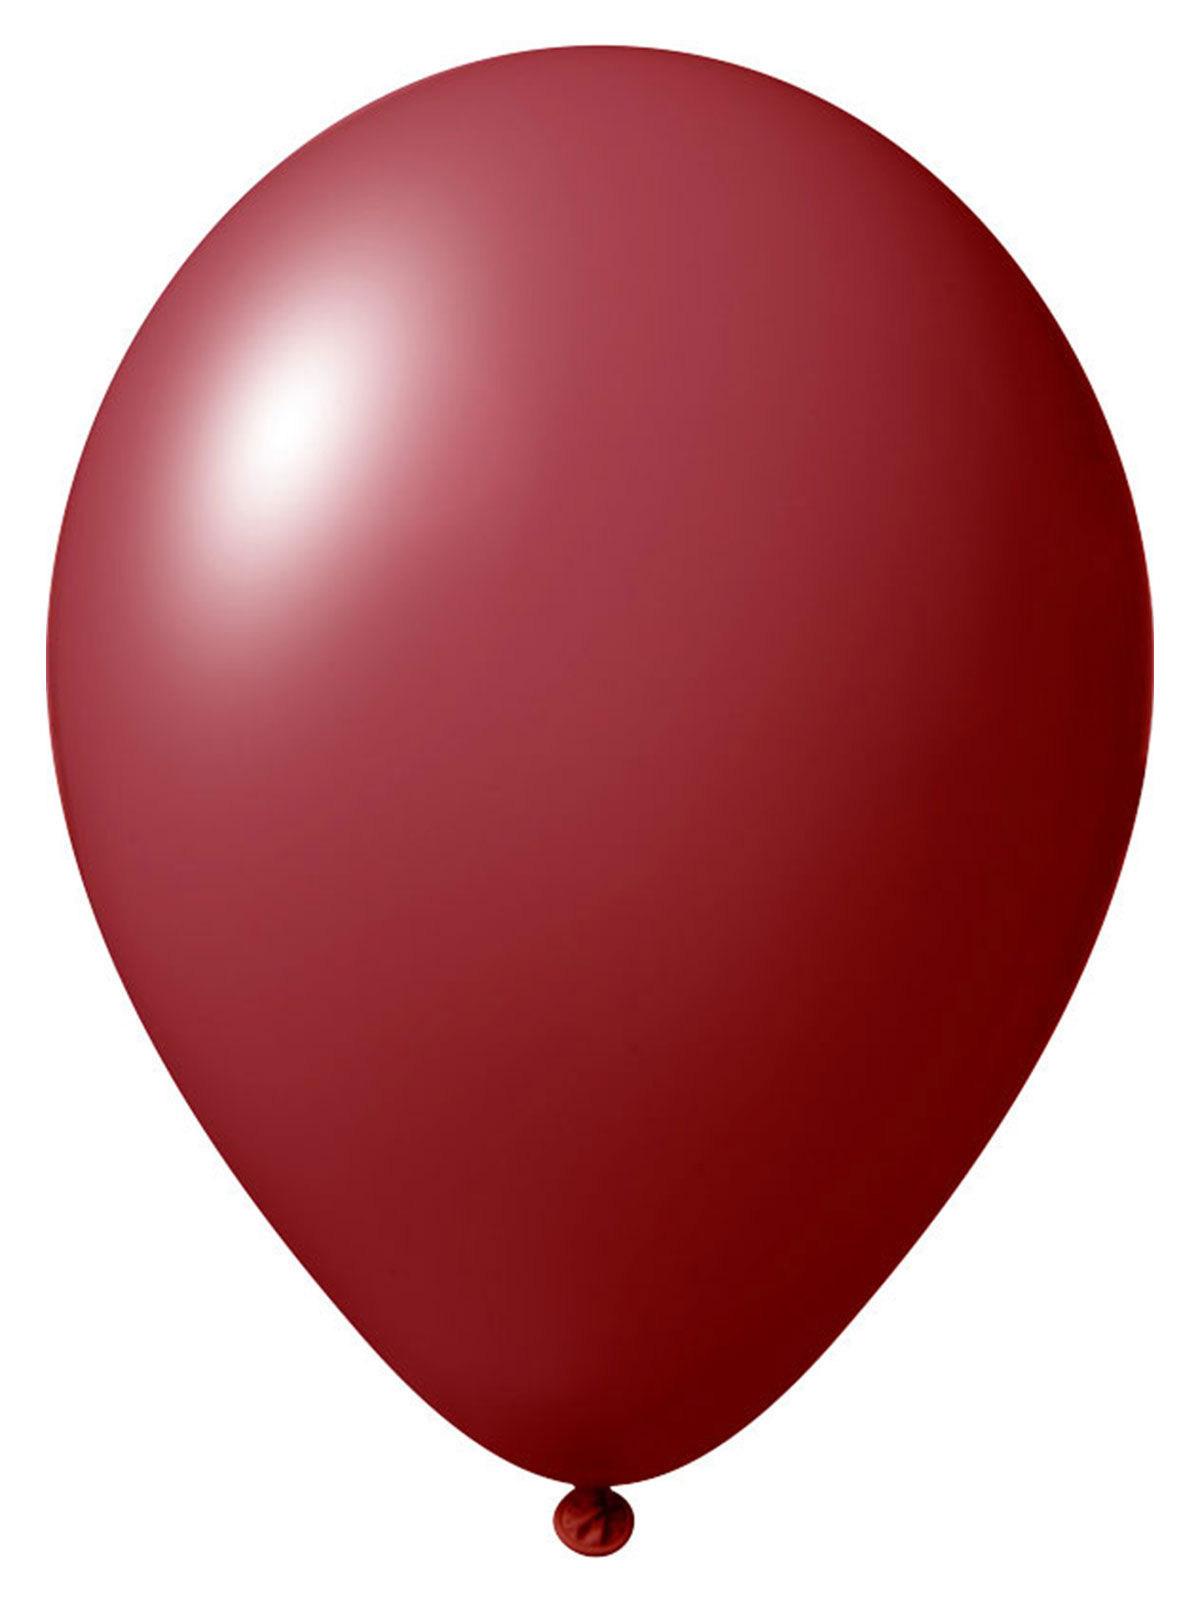 luftballon set 24 st ck ballons party deko weinrot 33cm g nstige faschings partydeko zubeh r. Black Bedroom Furniture Sets. Home Design Ideas